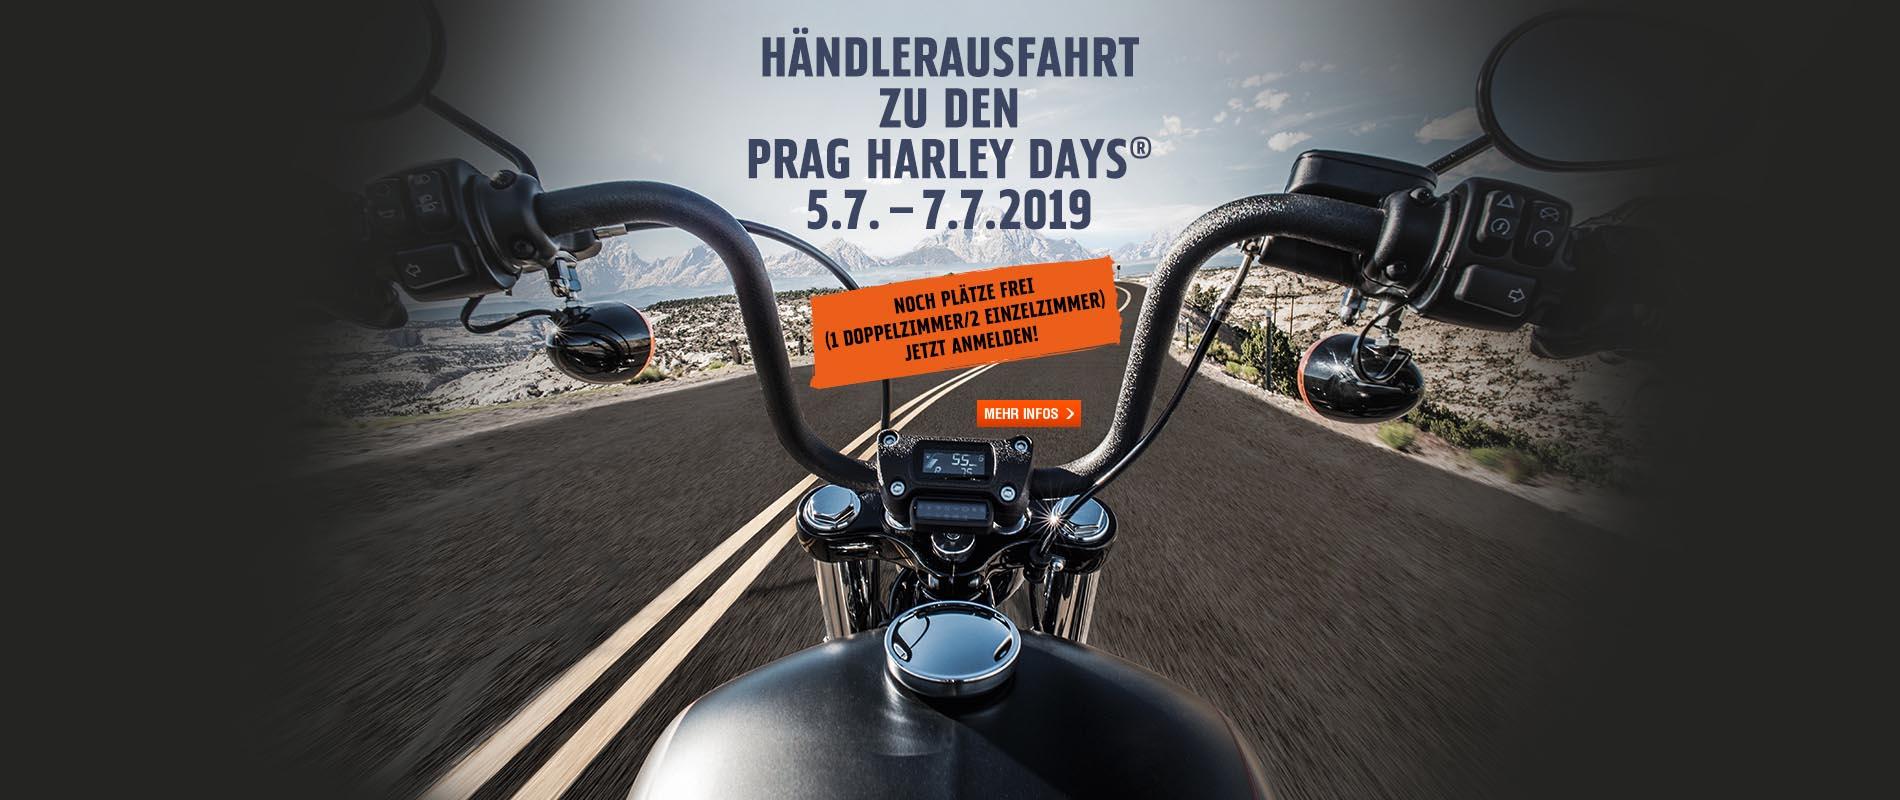 HD_Schwarzach_Billboard_HaendlerausfahrtPrag3